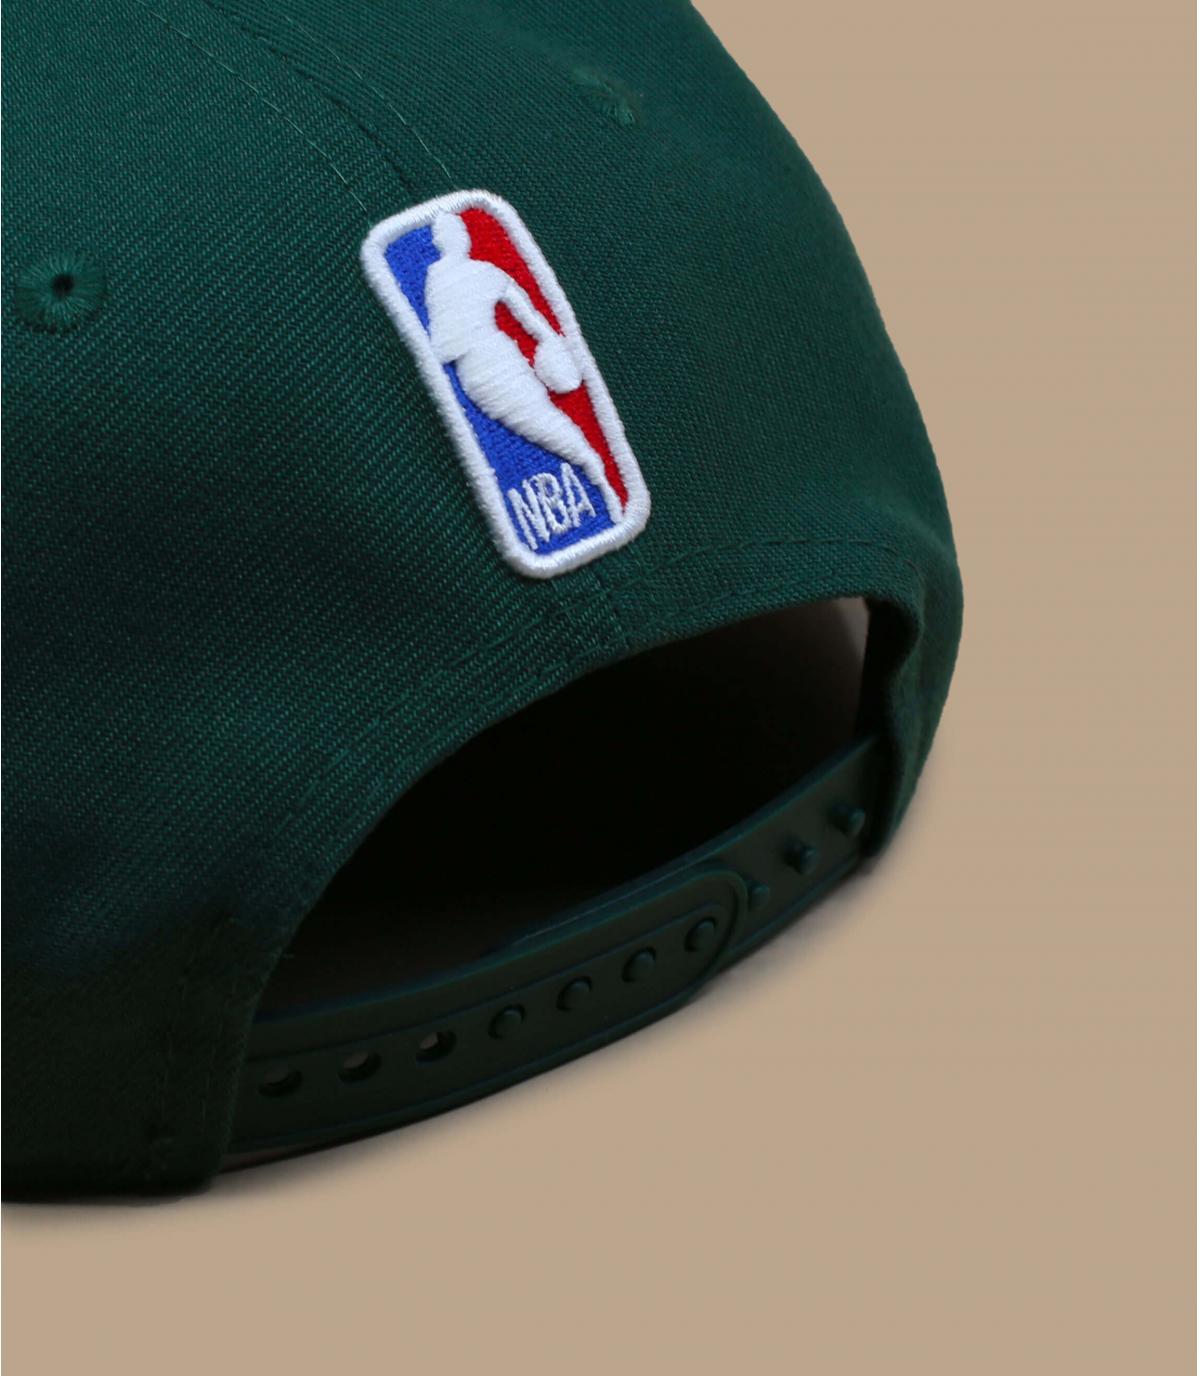 Details Snapback NBA Draft Bucks  950 - Abbildung 4